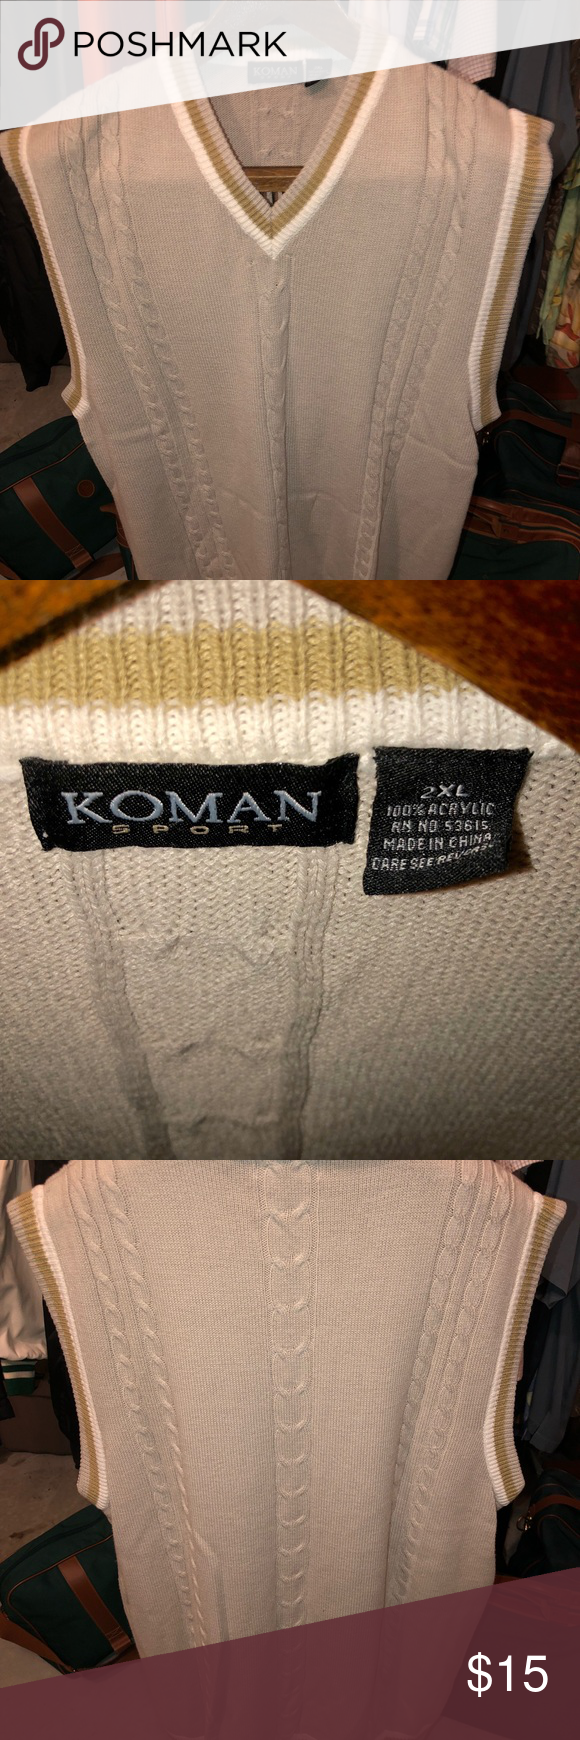 Koman Sport Vest Sports Vest Sports Jacket Clothes Design [ 1740 x 580 Pixel ]